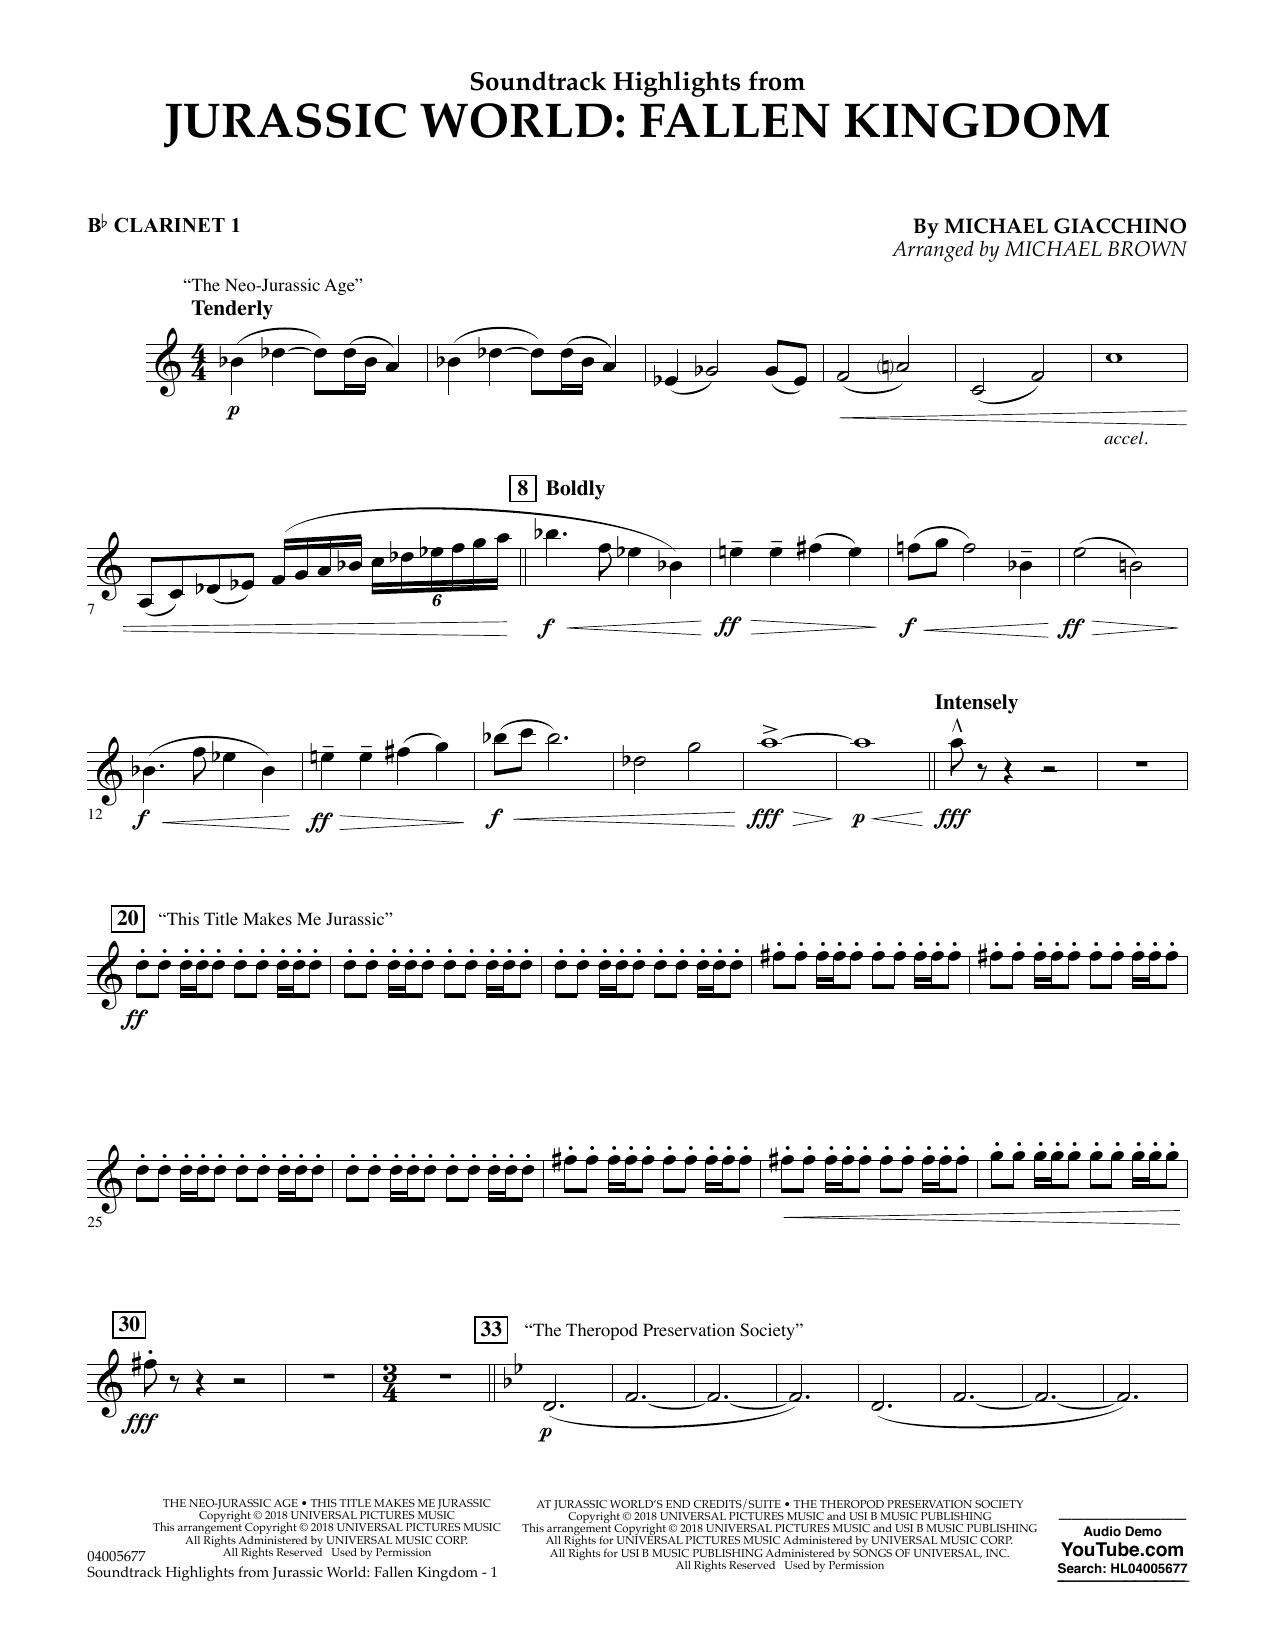 Highlights from Jurassic World: Fallen Kingdom (arr. Michael Brown) - Bb Clarinet 1 (Concert Band)